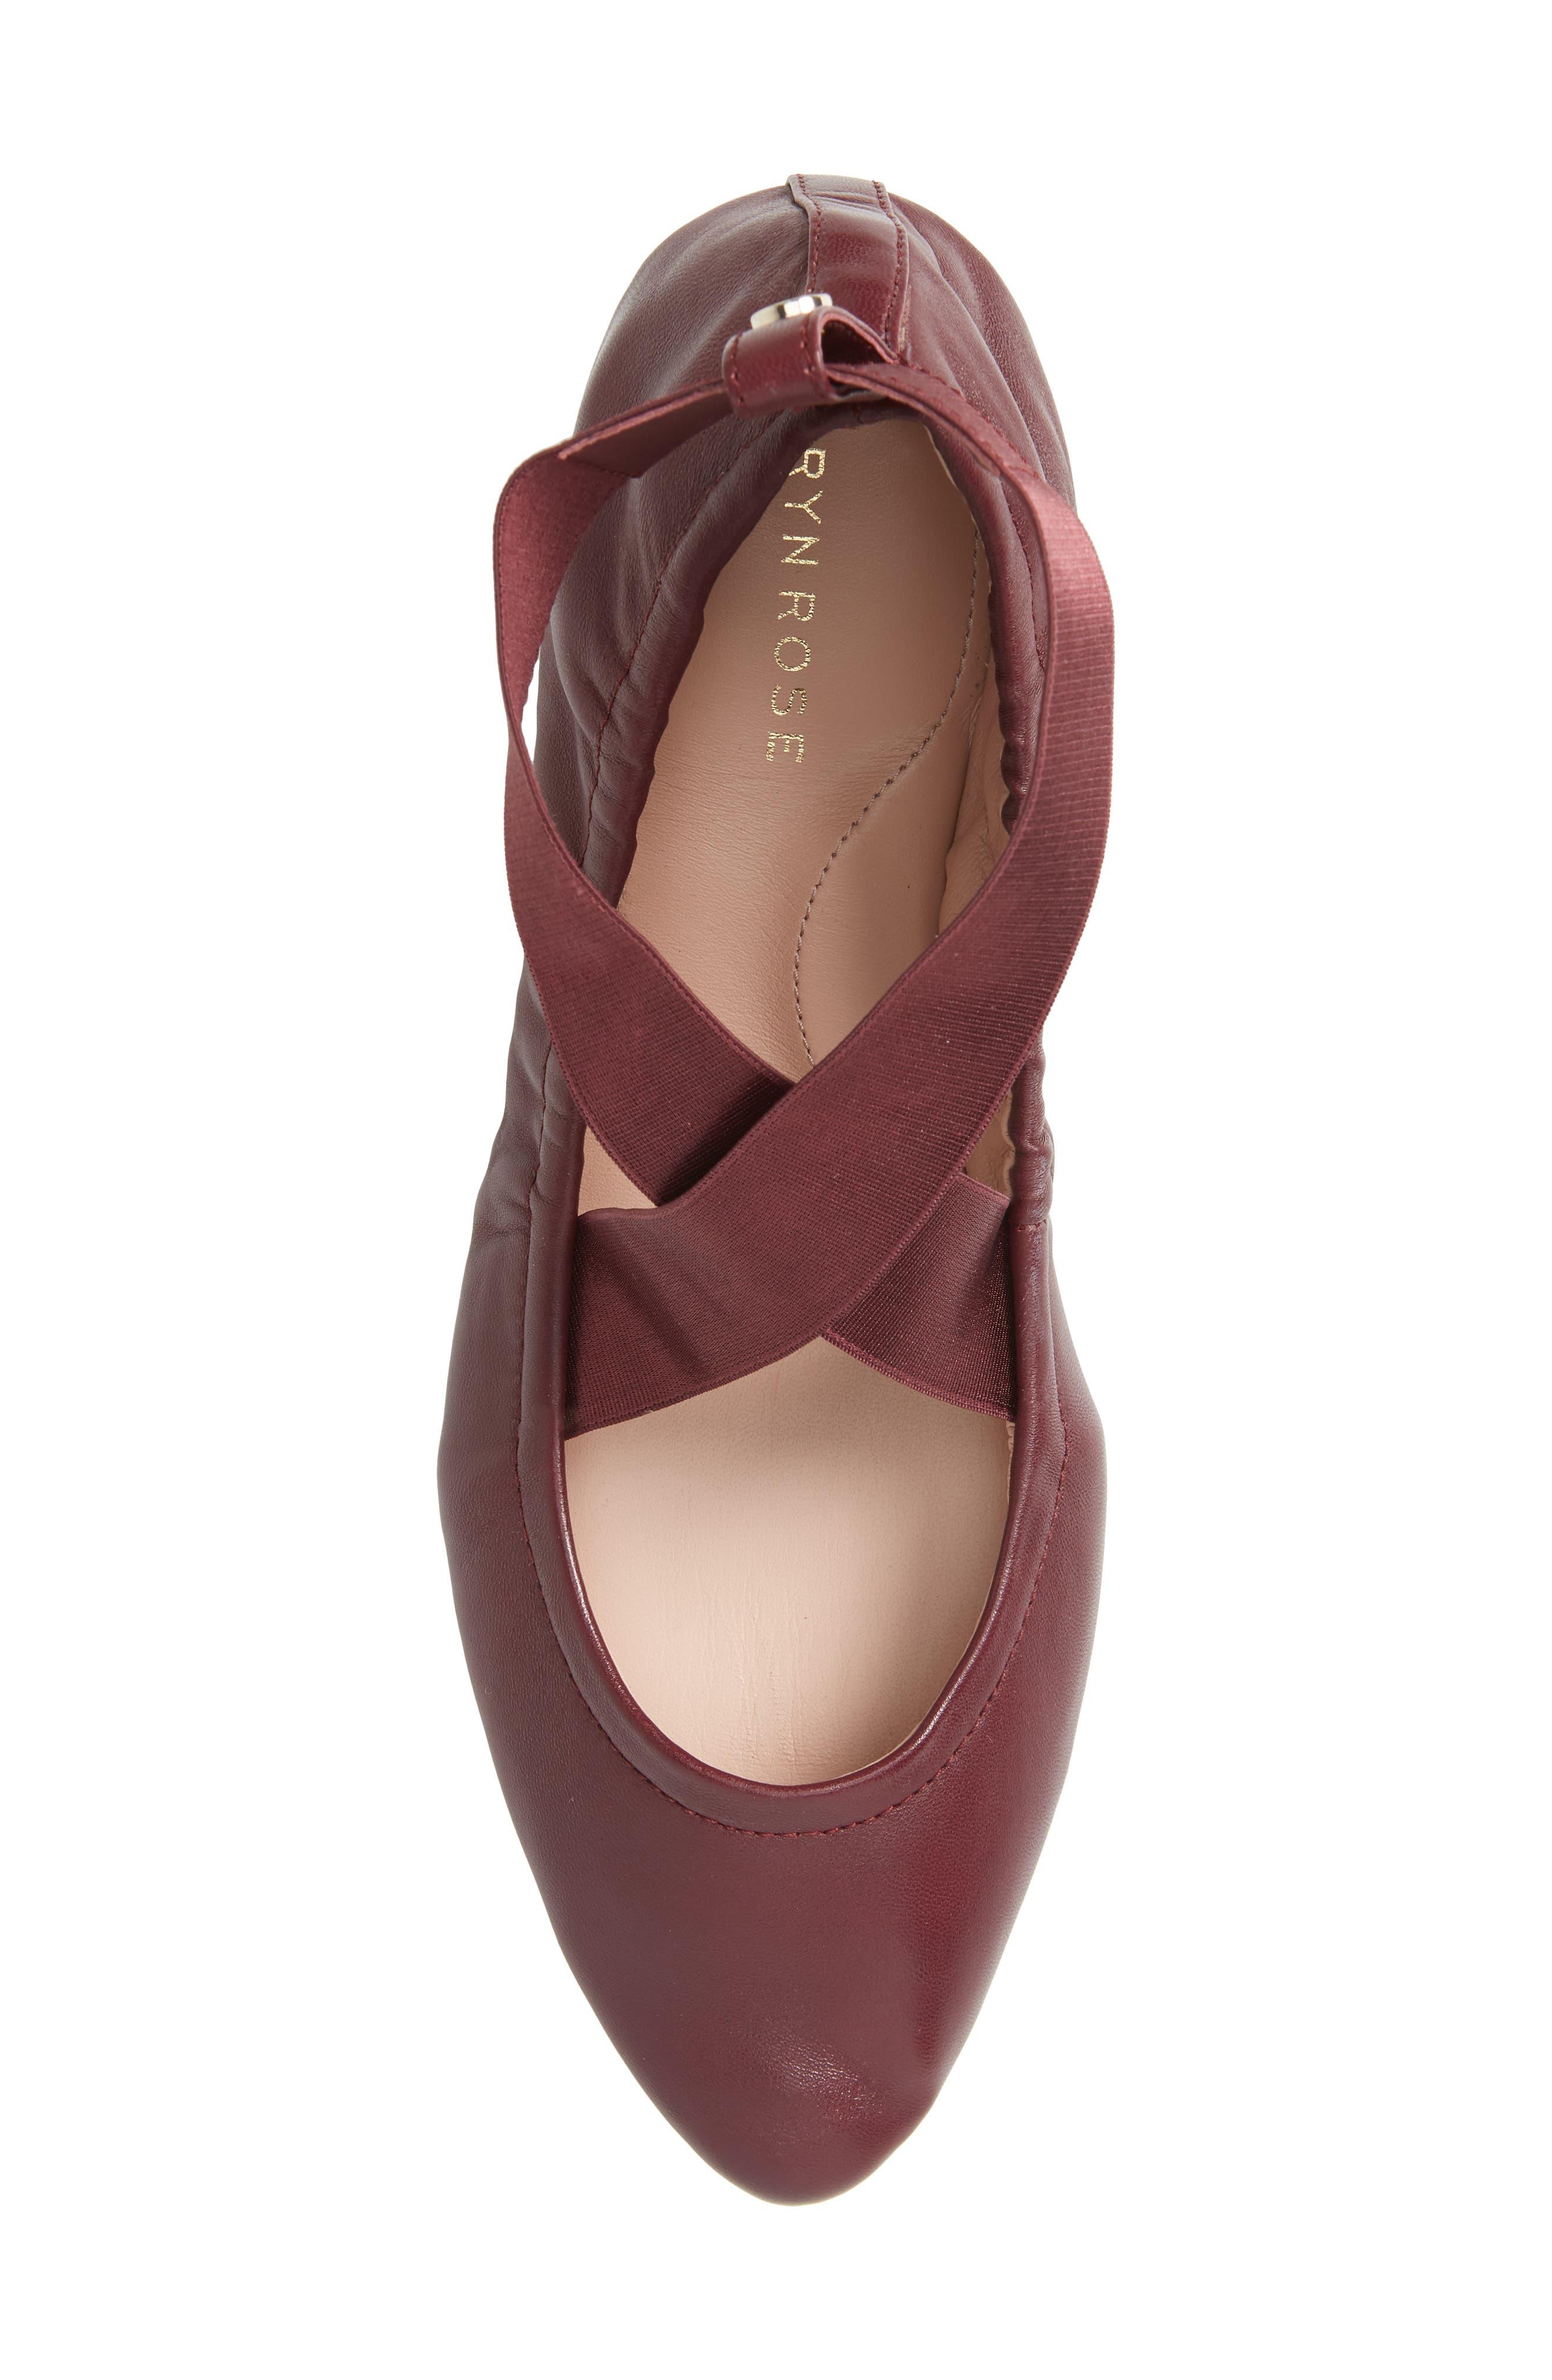 Edina Strappy Ballet Flat,                             Alternate thumbnail 25, color,